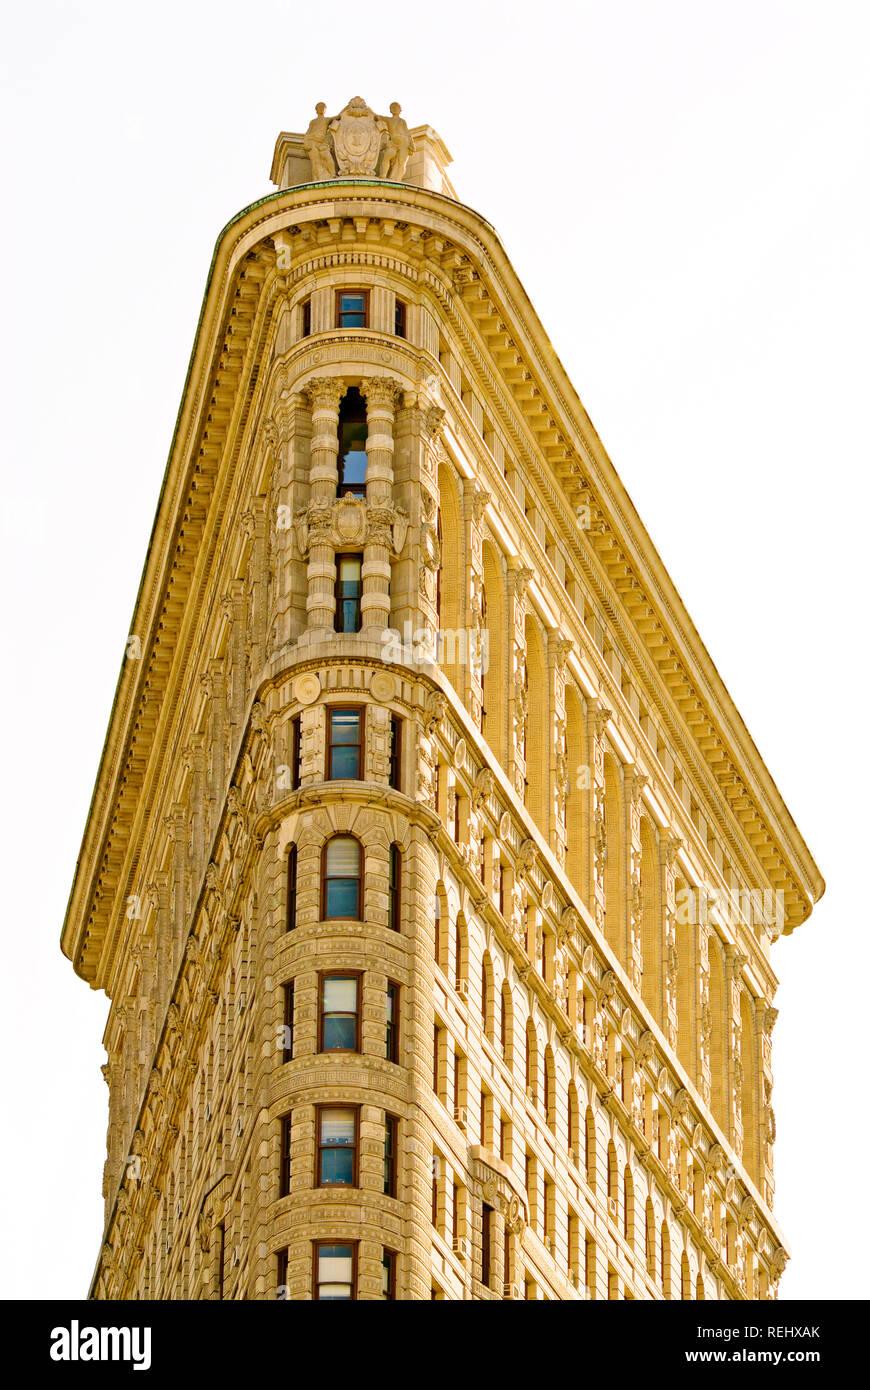 Flatiron Building Manhattan - Stock Image